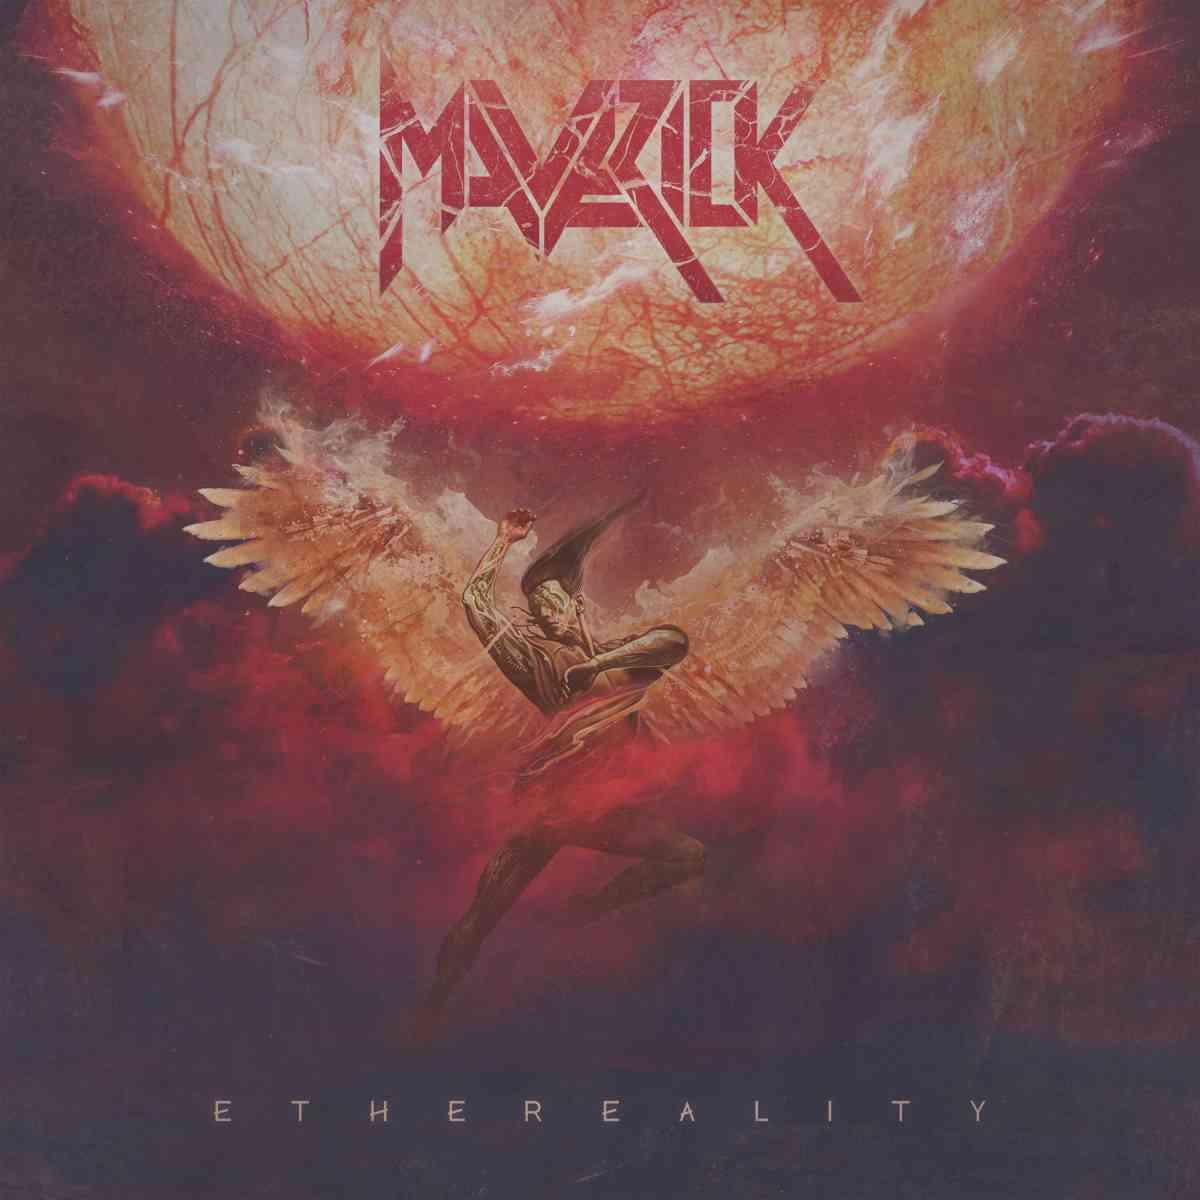 Maverick - Ethereality - album cover